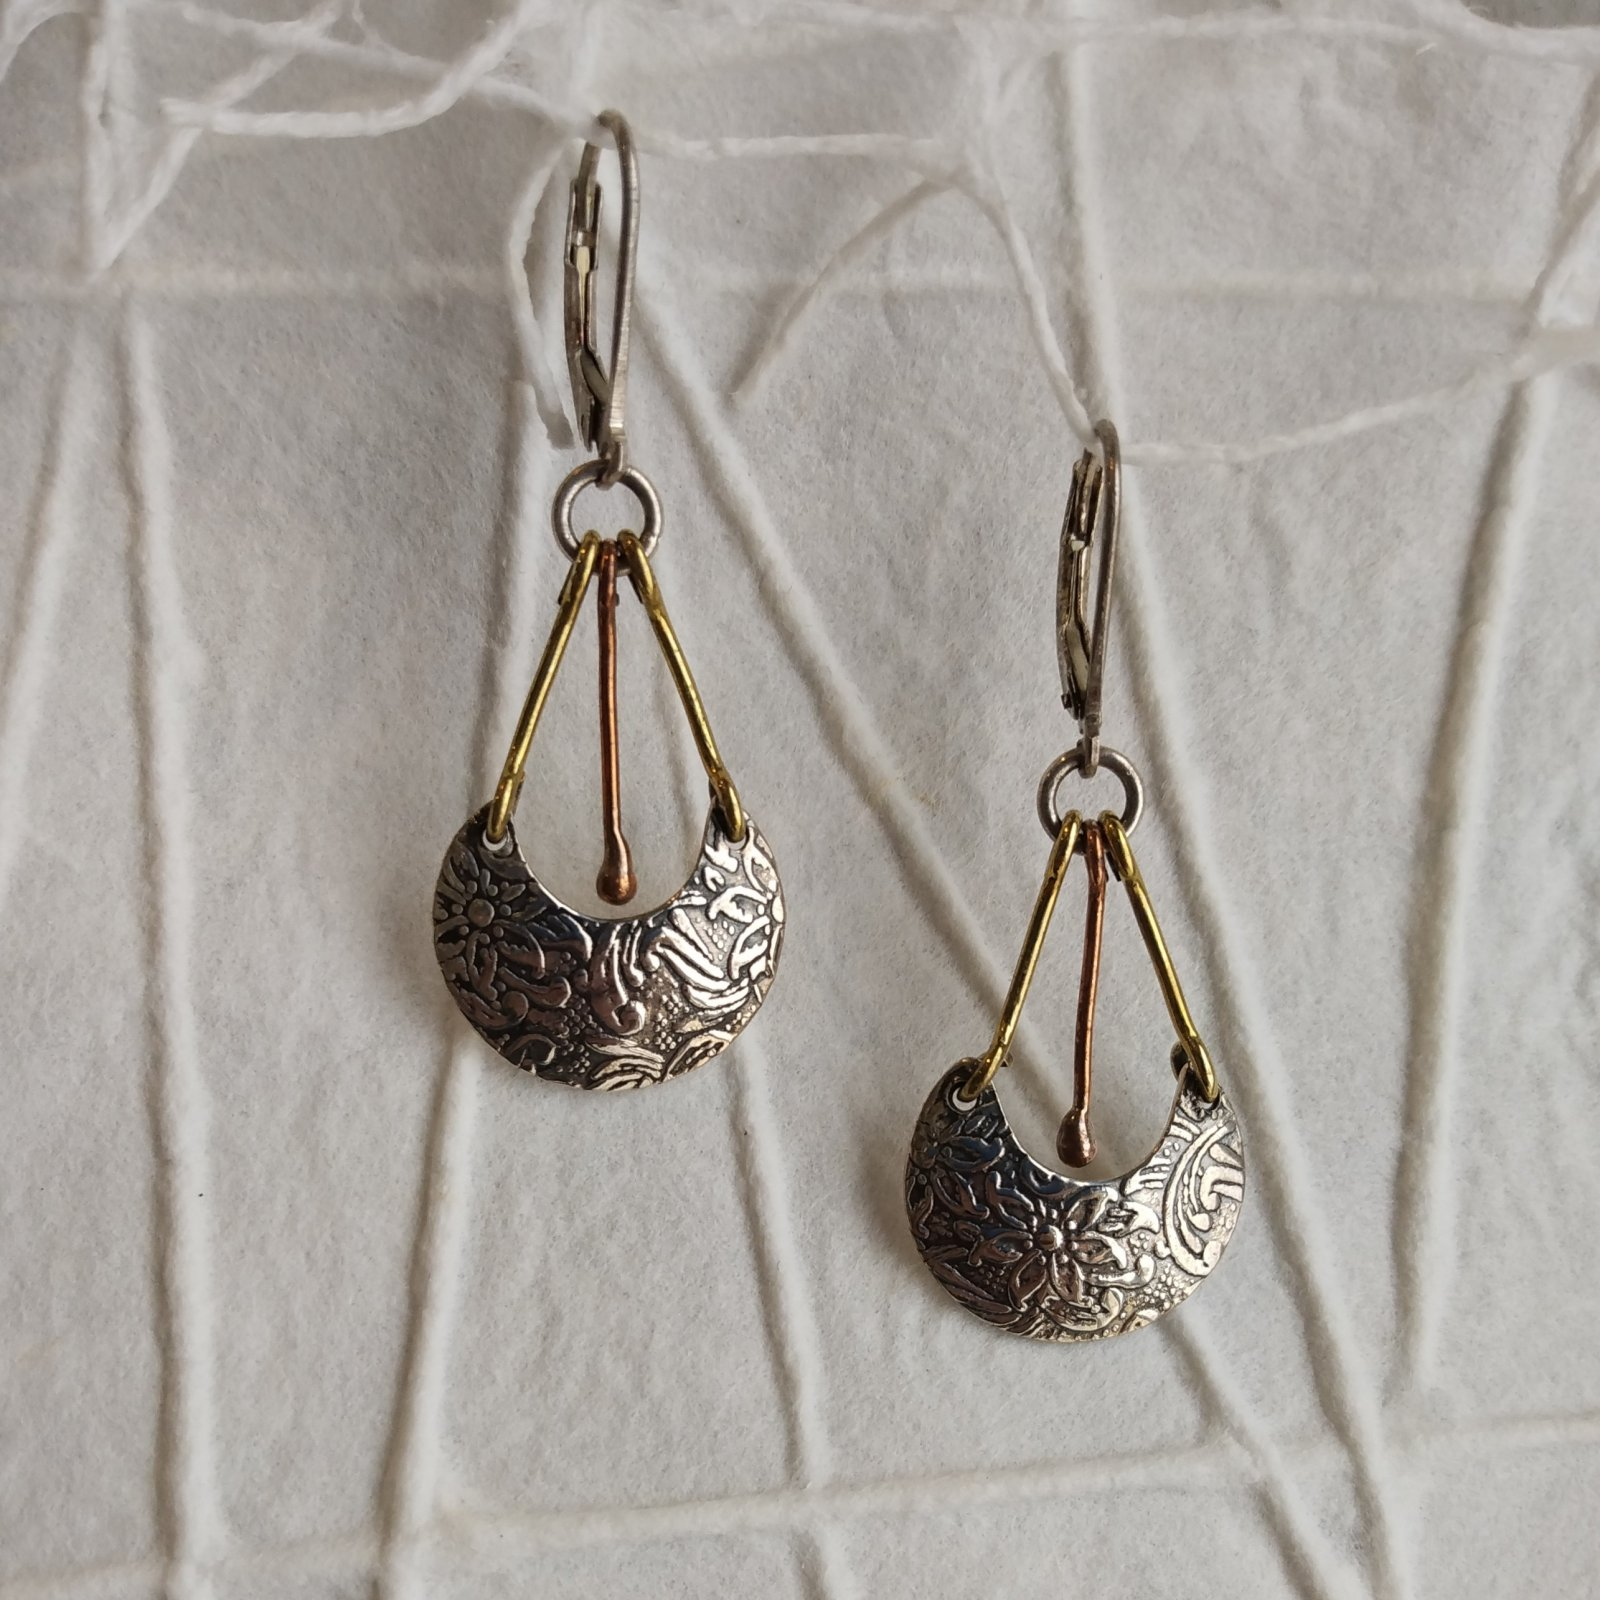 Silver Mixed Metal Earrings